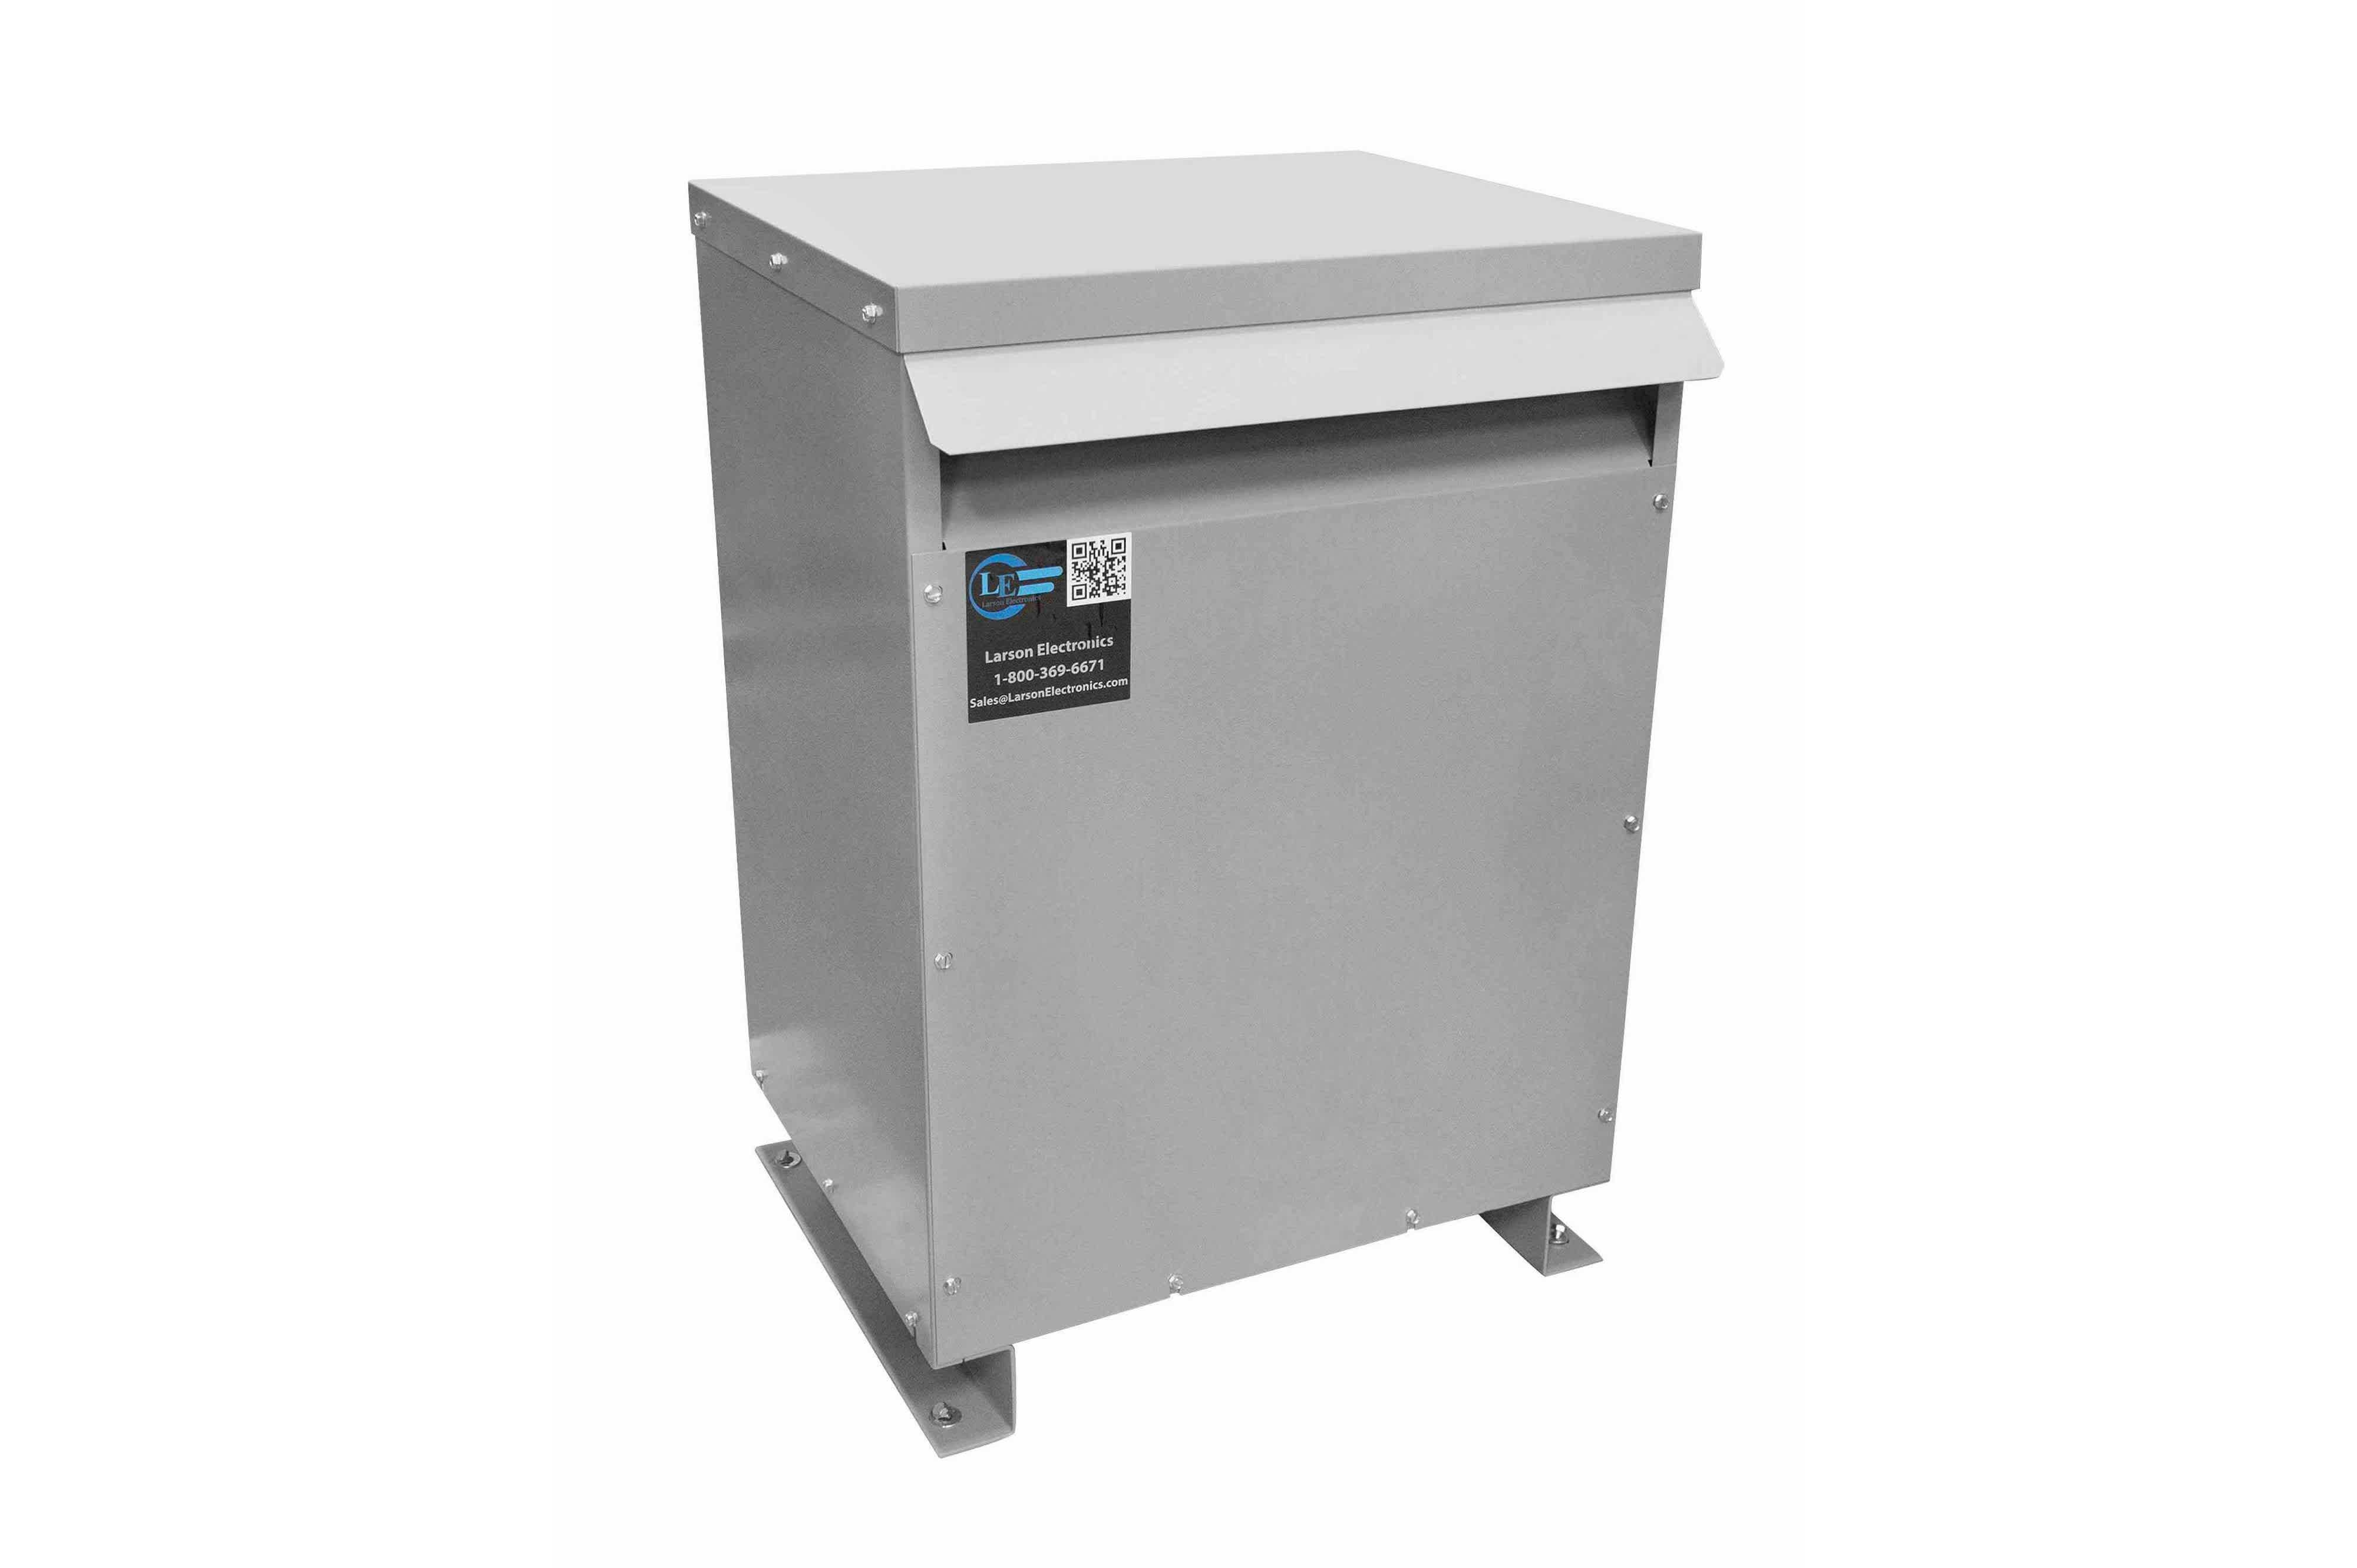 36 kVA 3PH Isolation Transformer, 240V Wye Primary, 208V Delta Secondary, N3R, Ventilated, 60 Hz